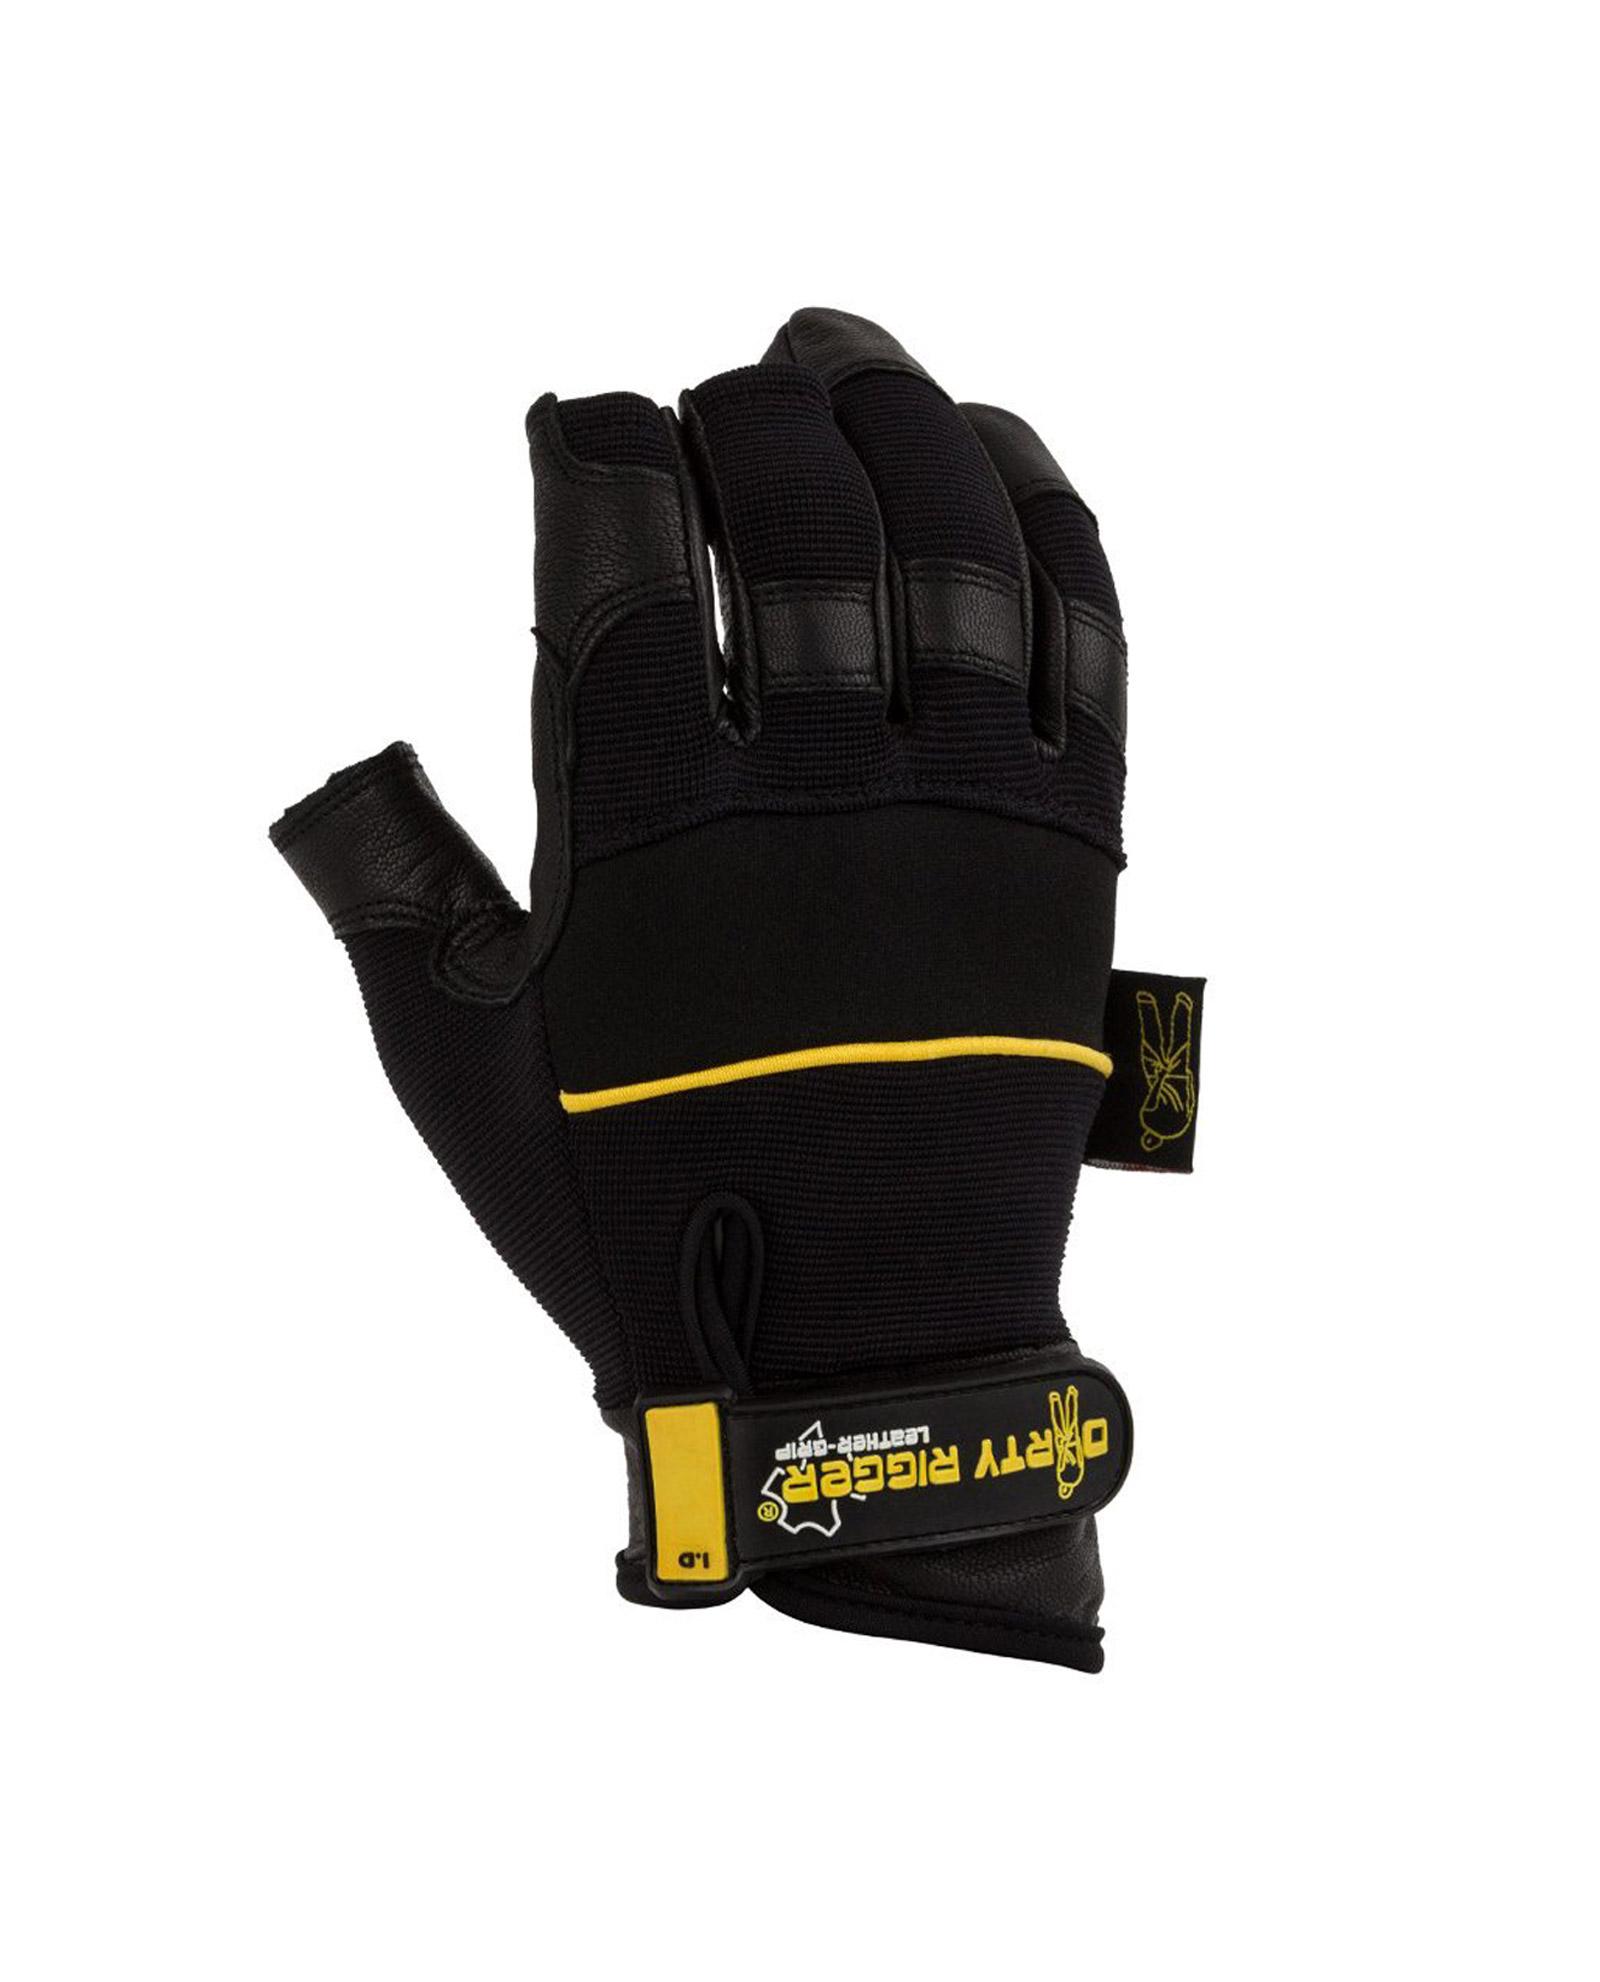 Dirty Rigger Glove Dty Lfrm Leather Grip Framer Glove